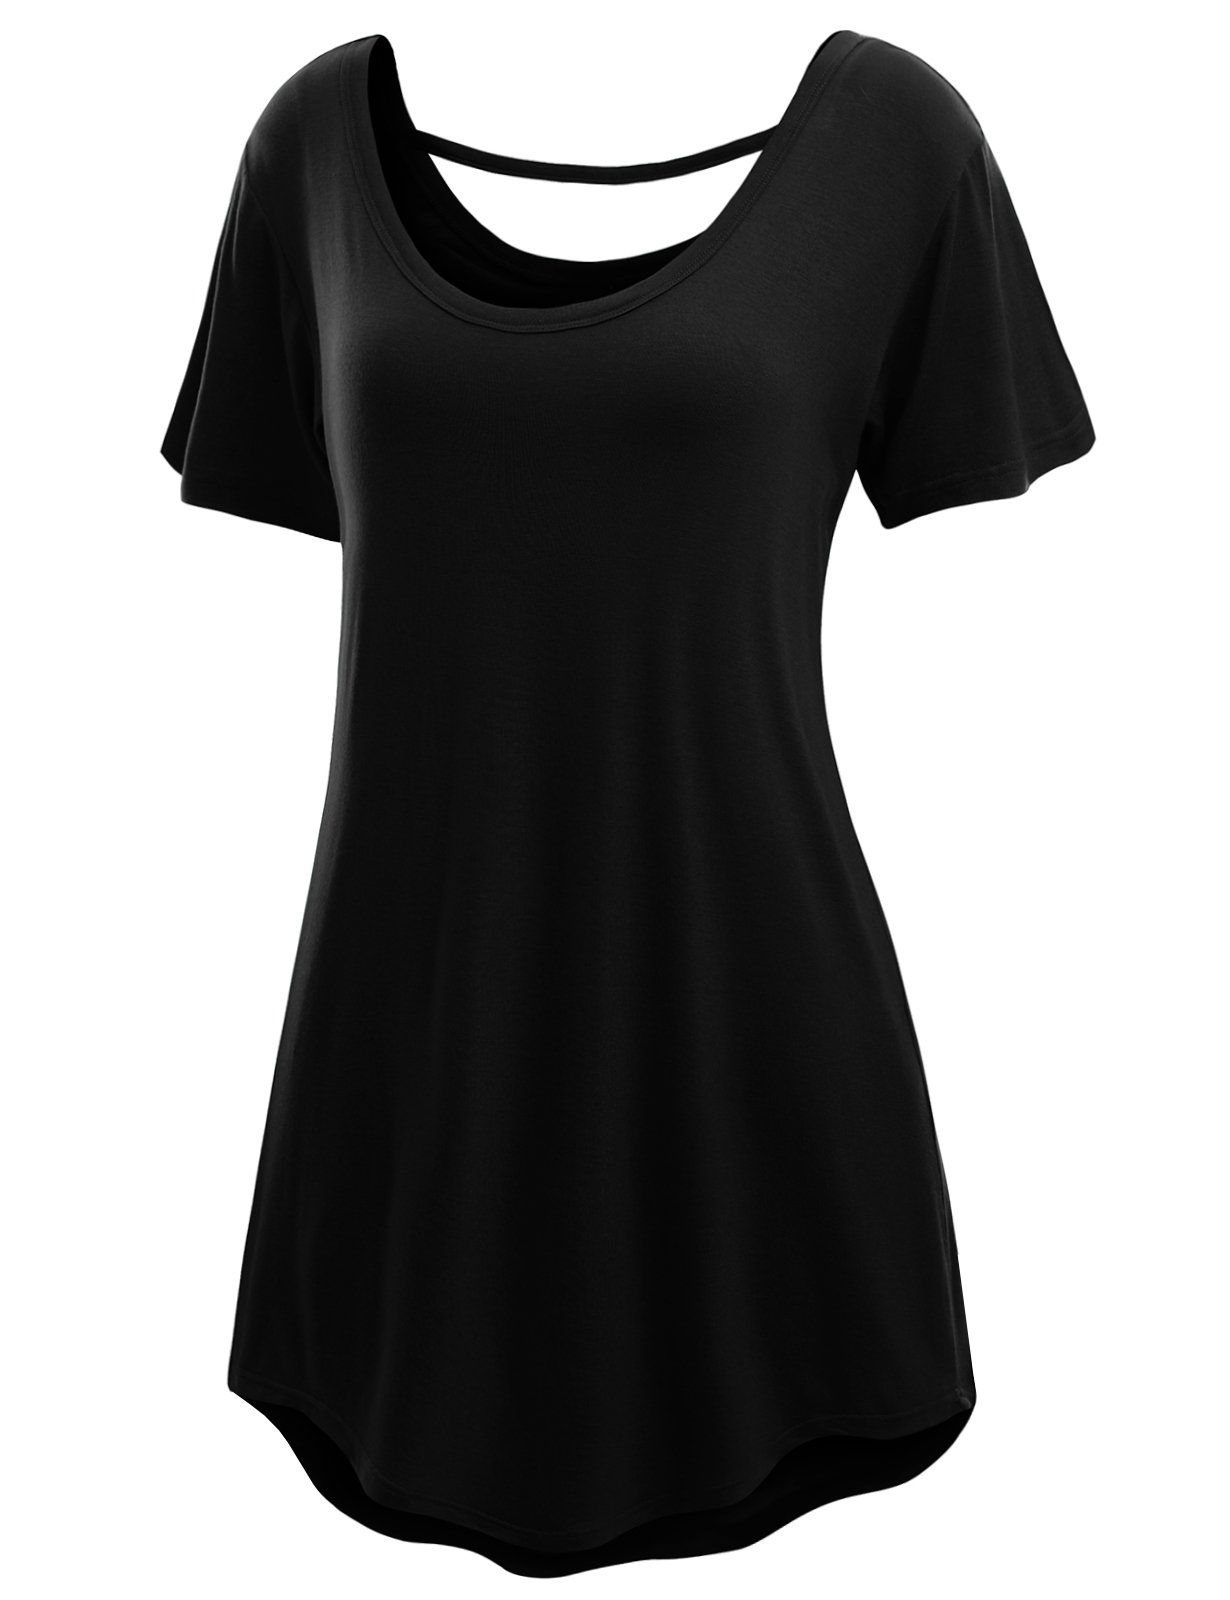 02c41eef5e2 Short Sleeve T Shirt Dress Amazon